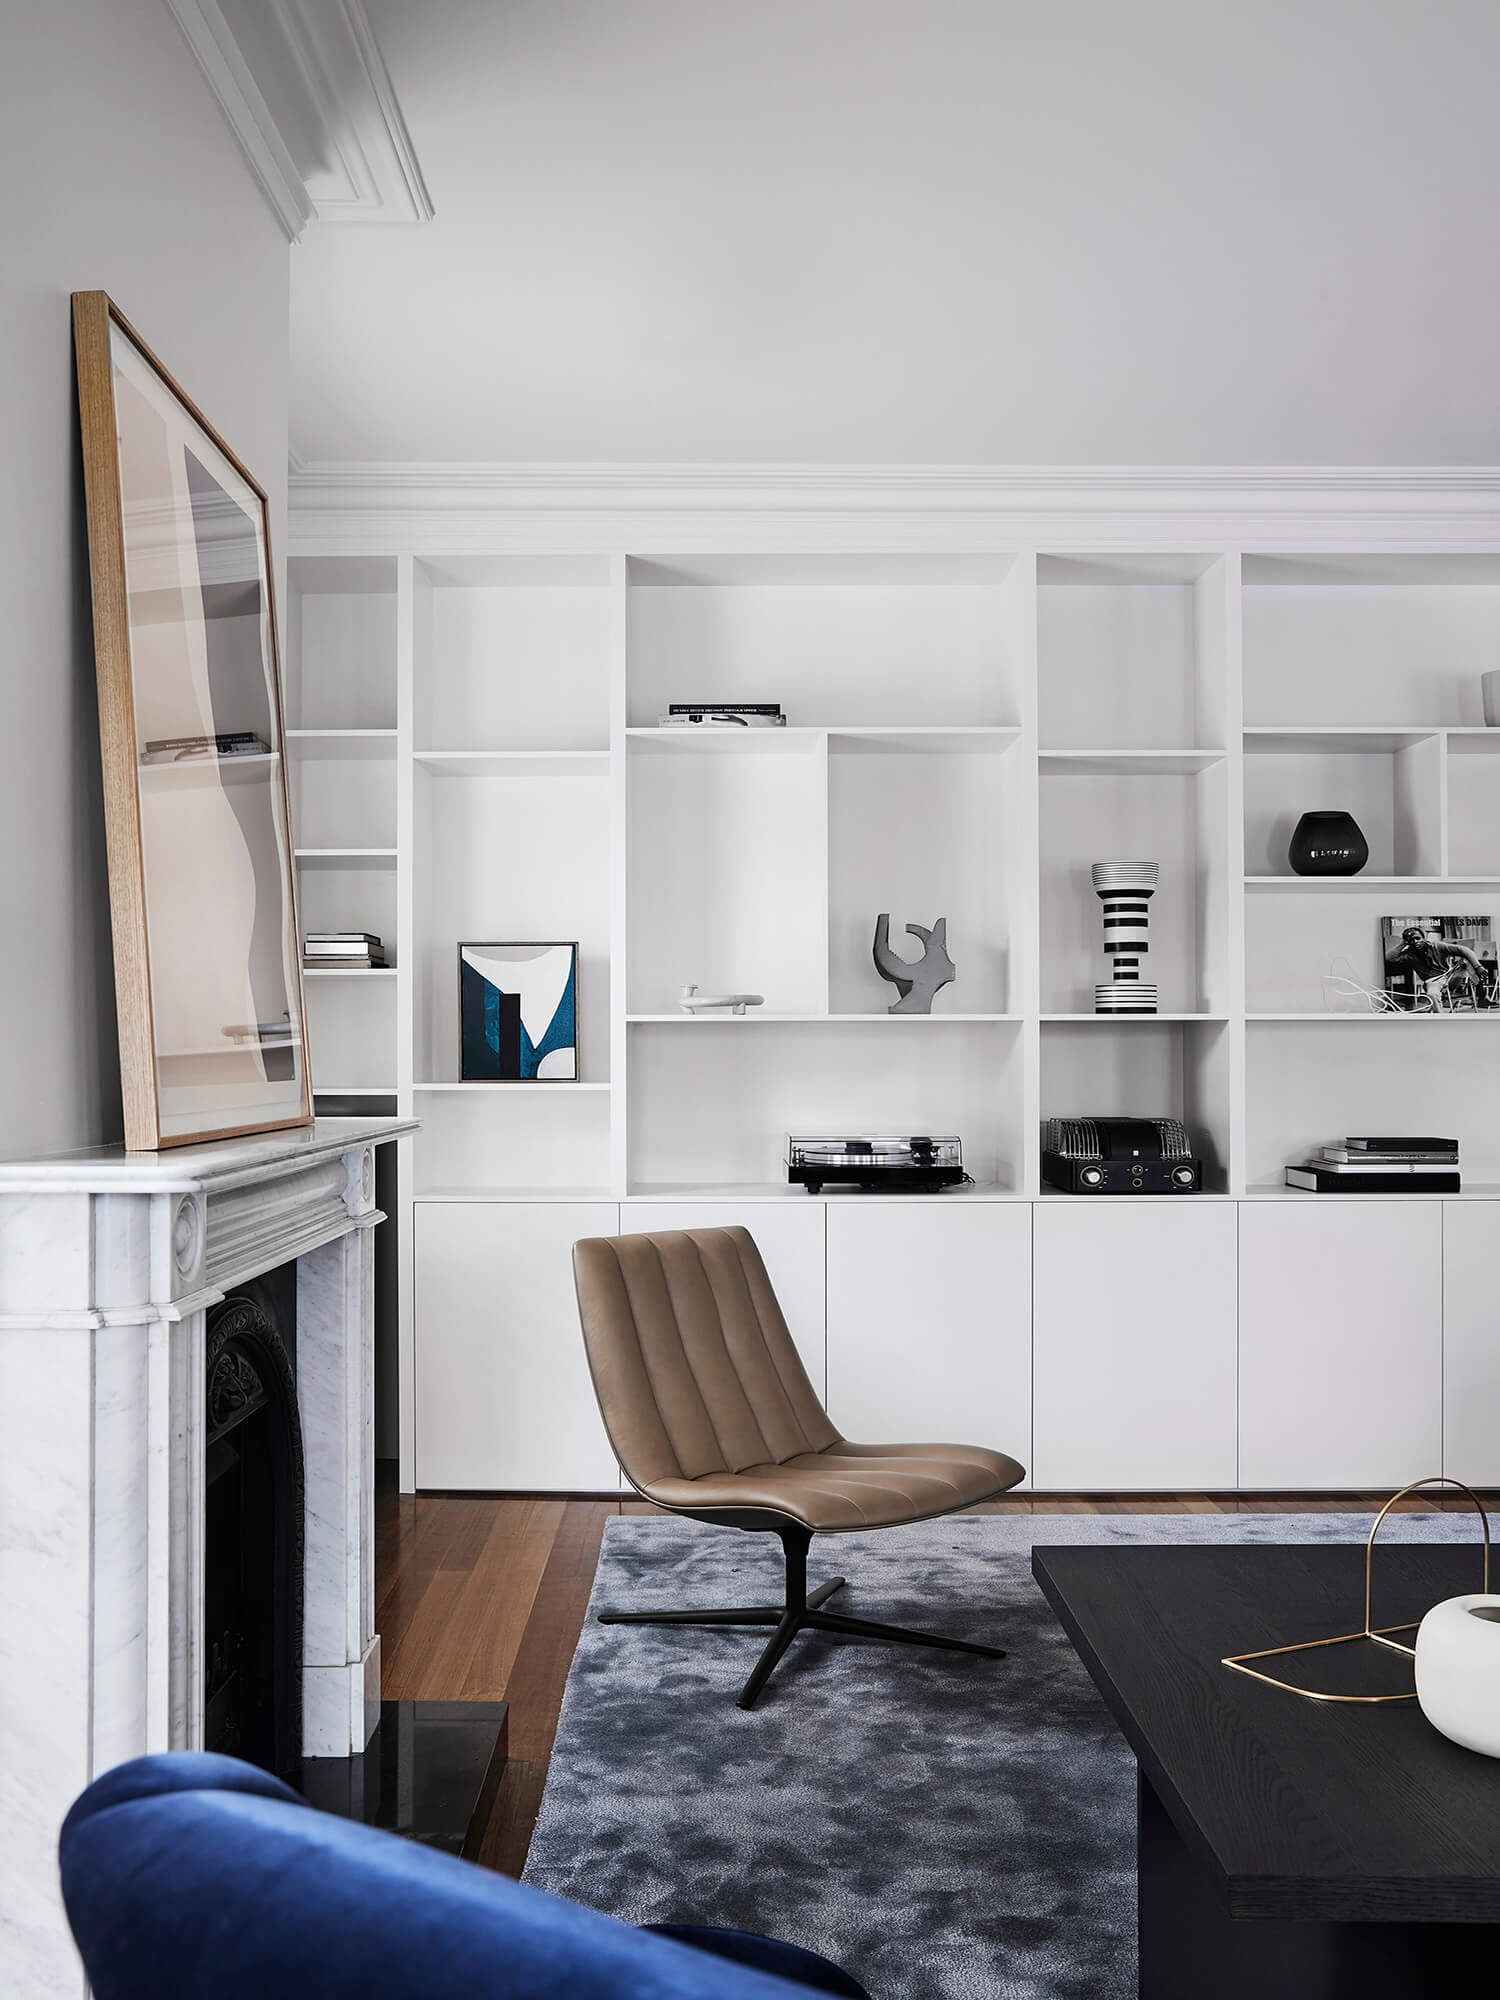 Blue notes house interior design studio interior styling interior design inspiration interior ideas